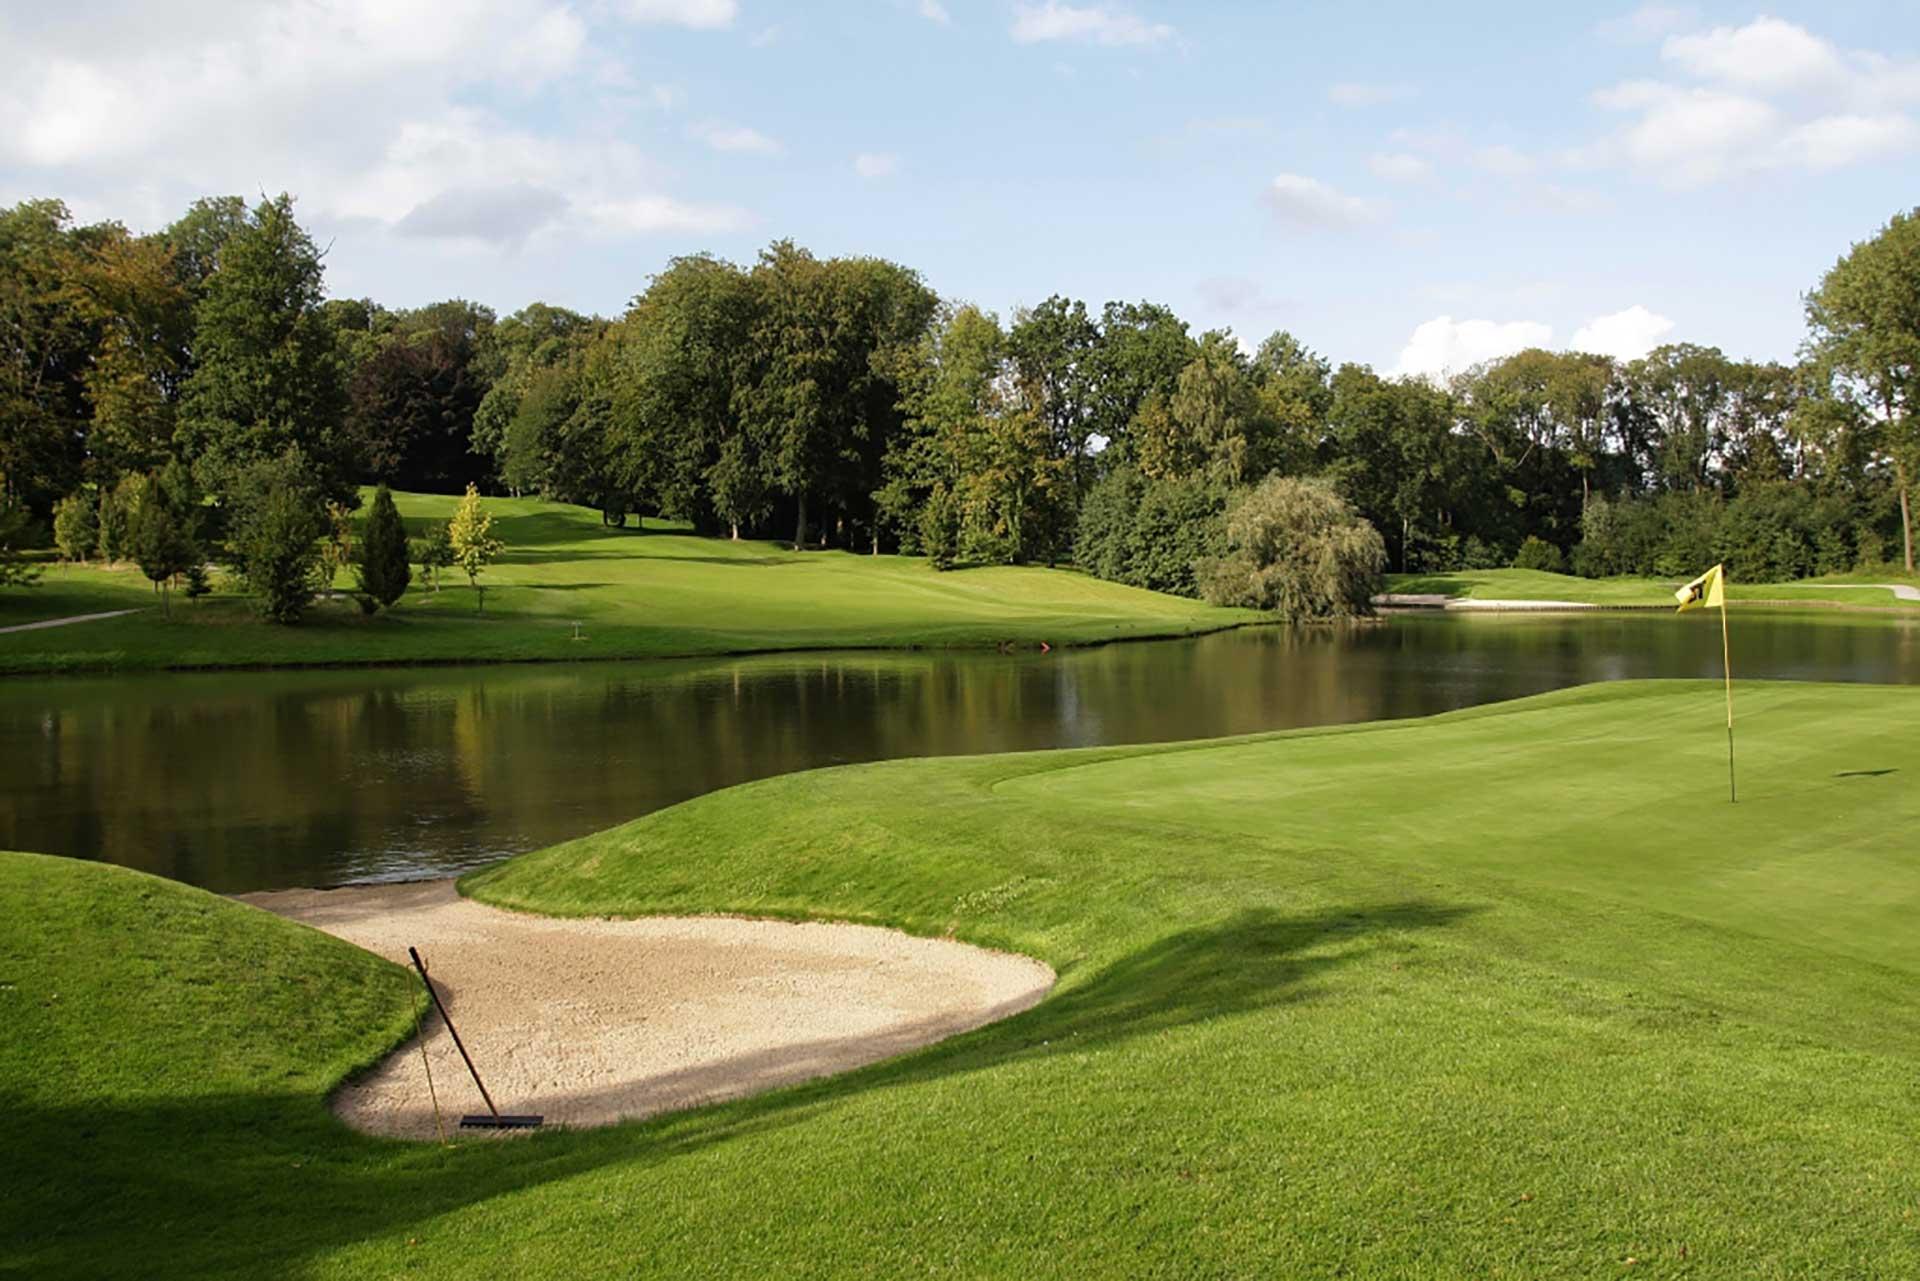 Golfexpedition-Golfreizen-België-Brussel-Pierpont-course